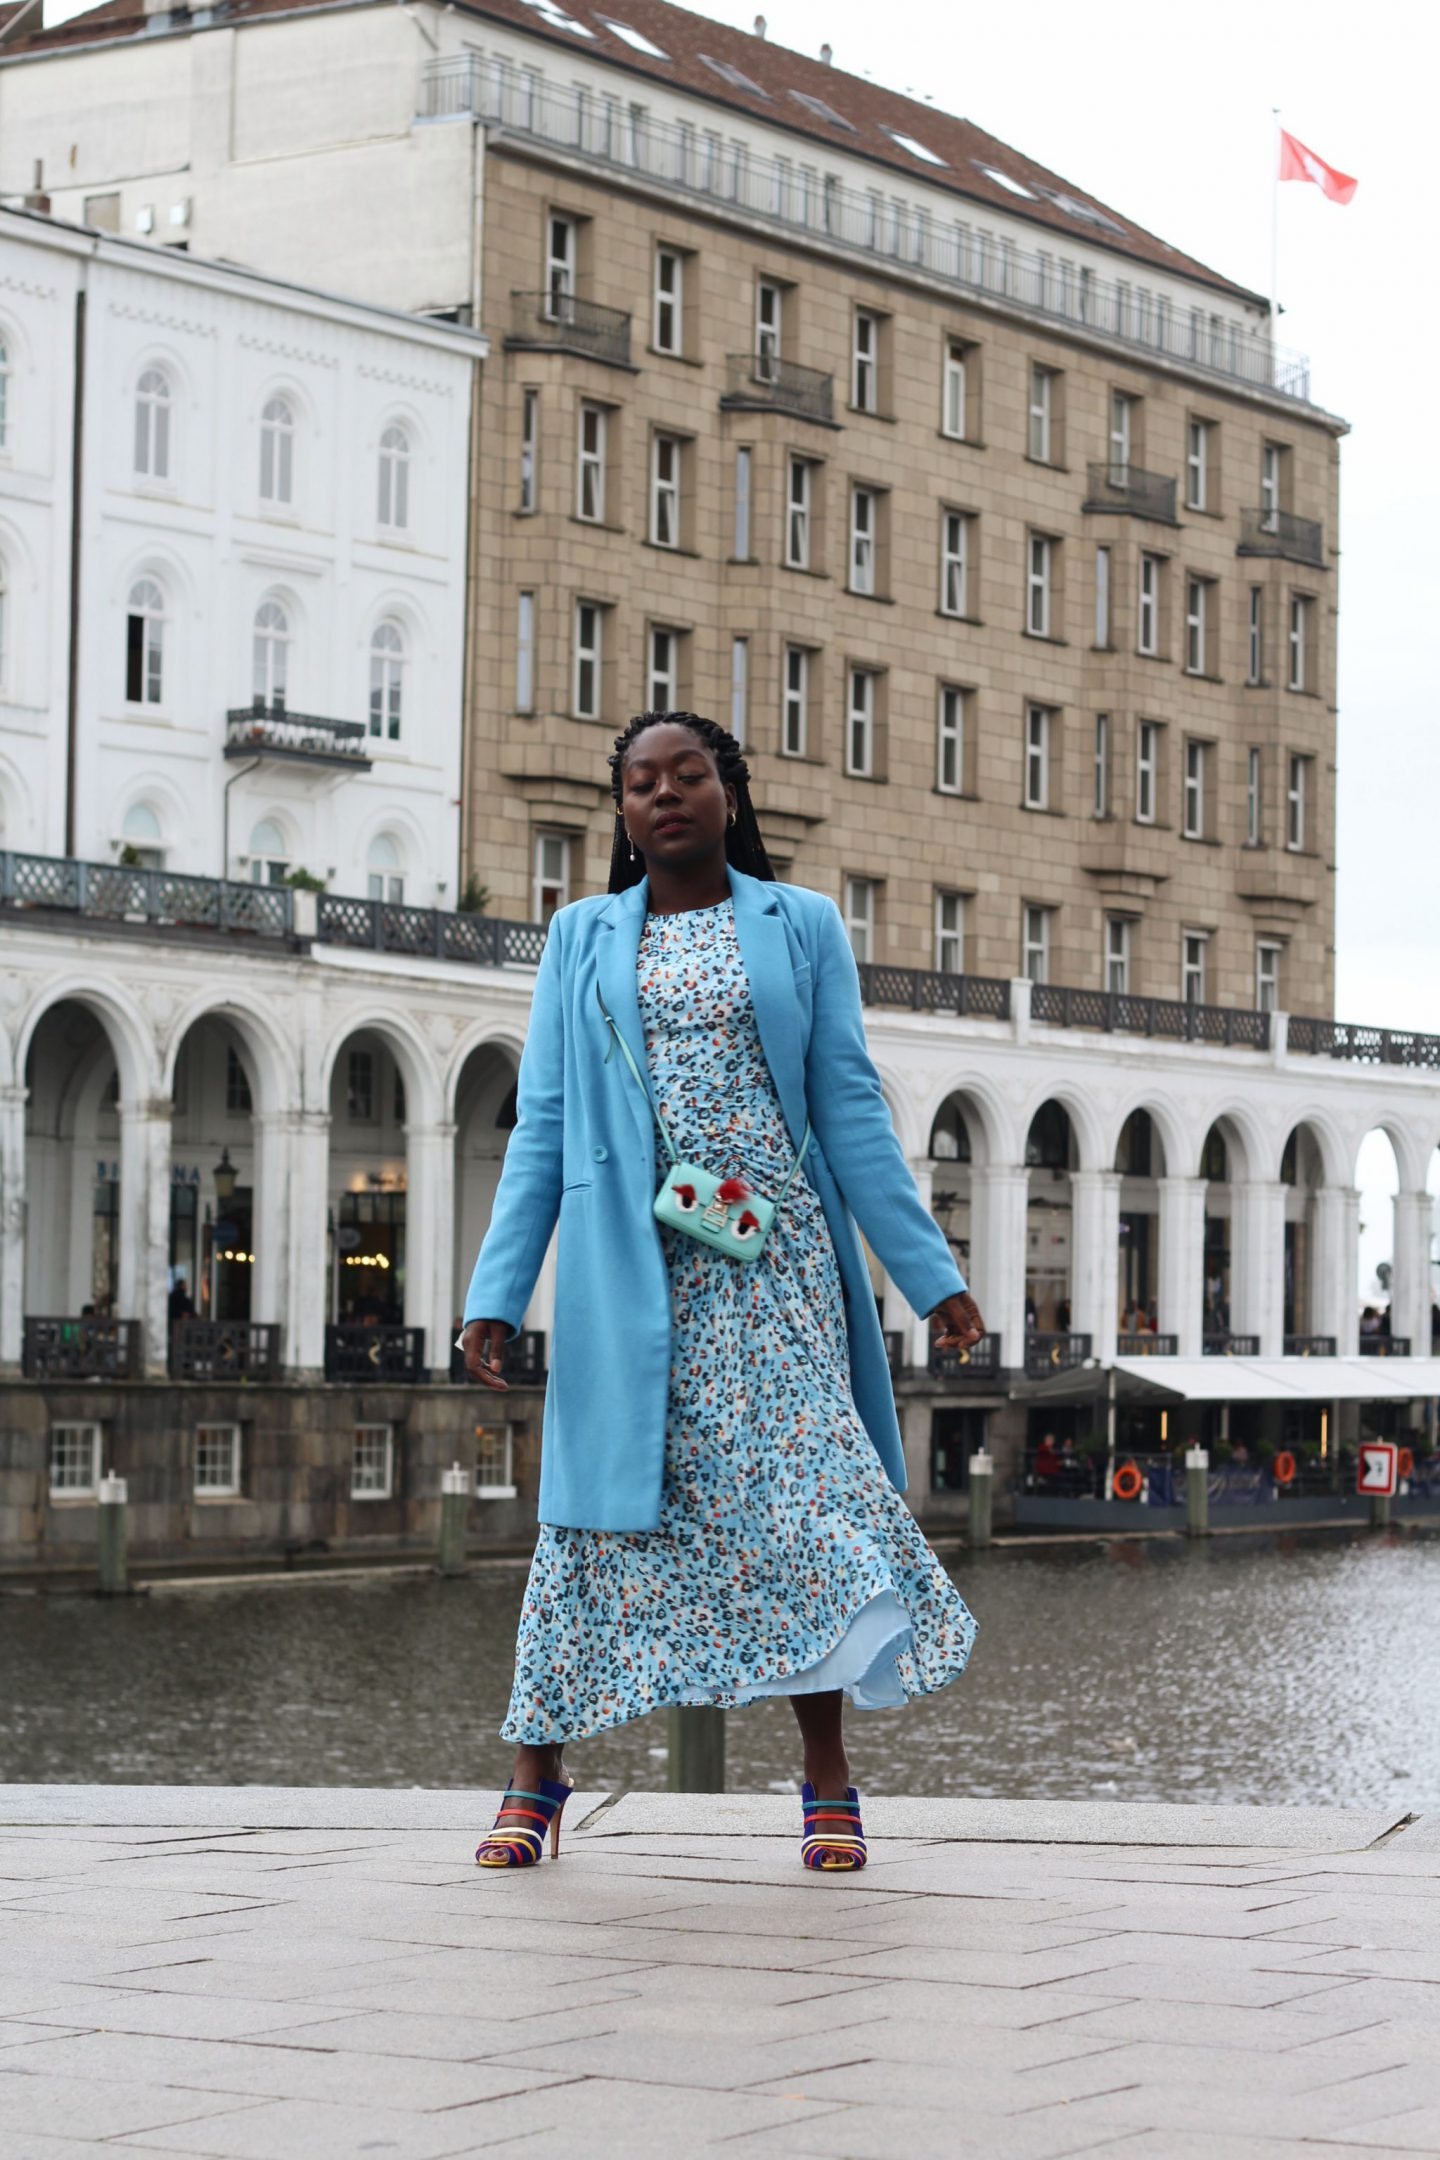 Lala_Berlin_Streetstyle_Lois_Opoku_Fashion_Blogger_Fendi_Monster_Malone_Souliers_lisforlois_6